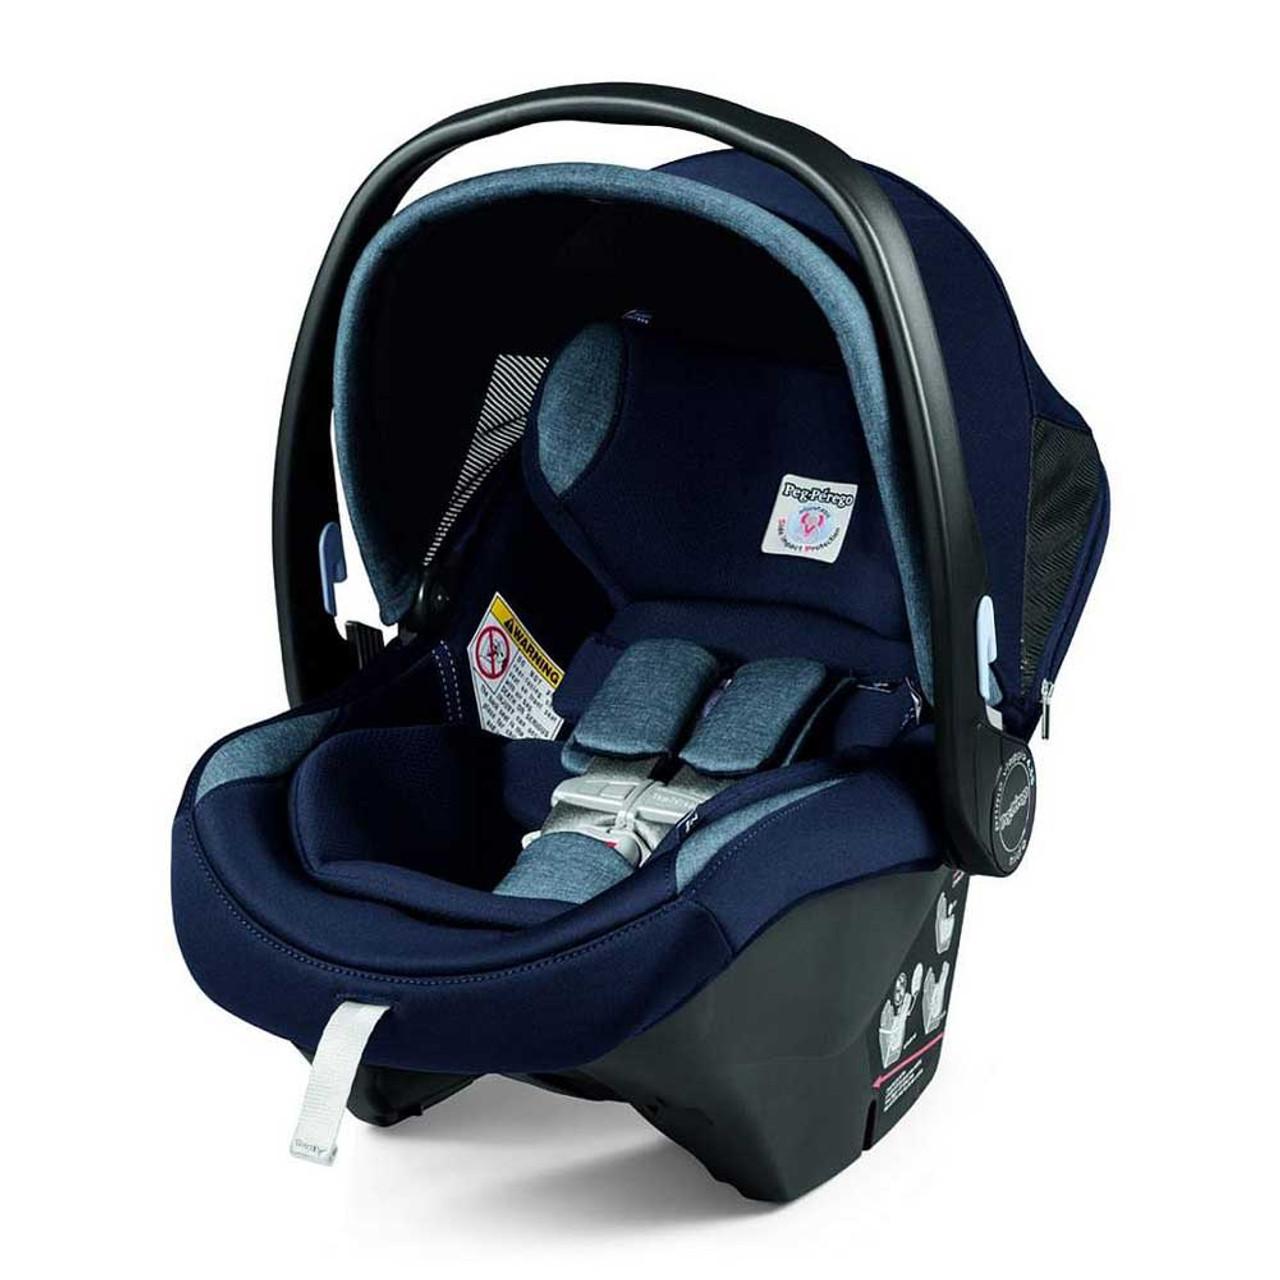 Peg Perego Primo Viaggio Nido 4 35 Infant Car Seat